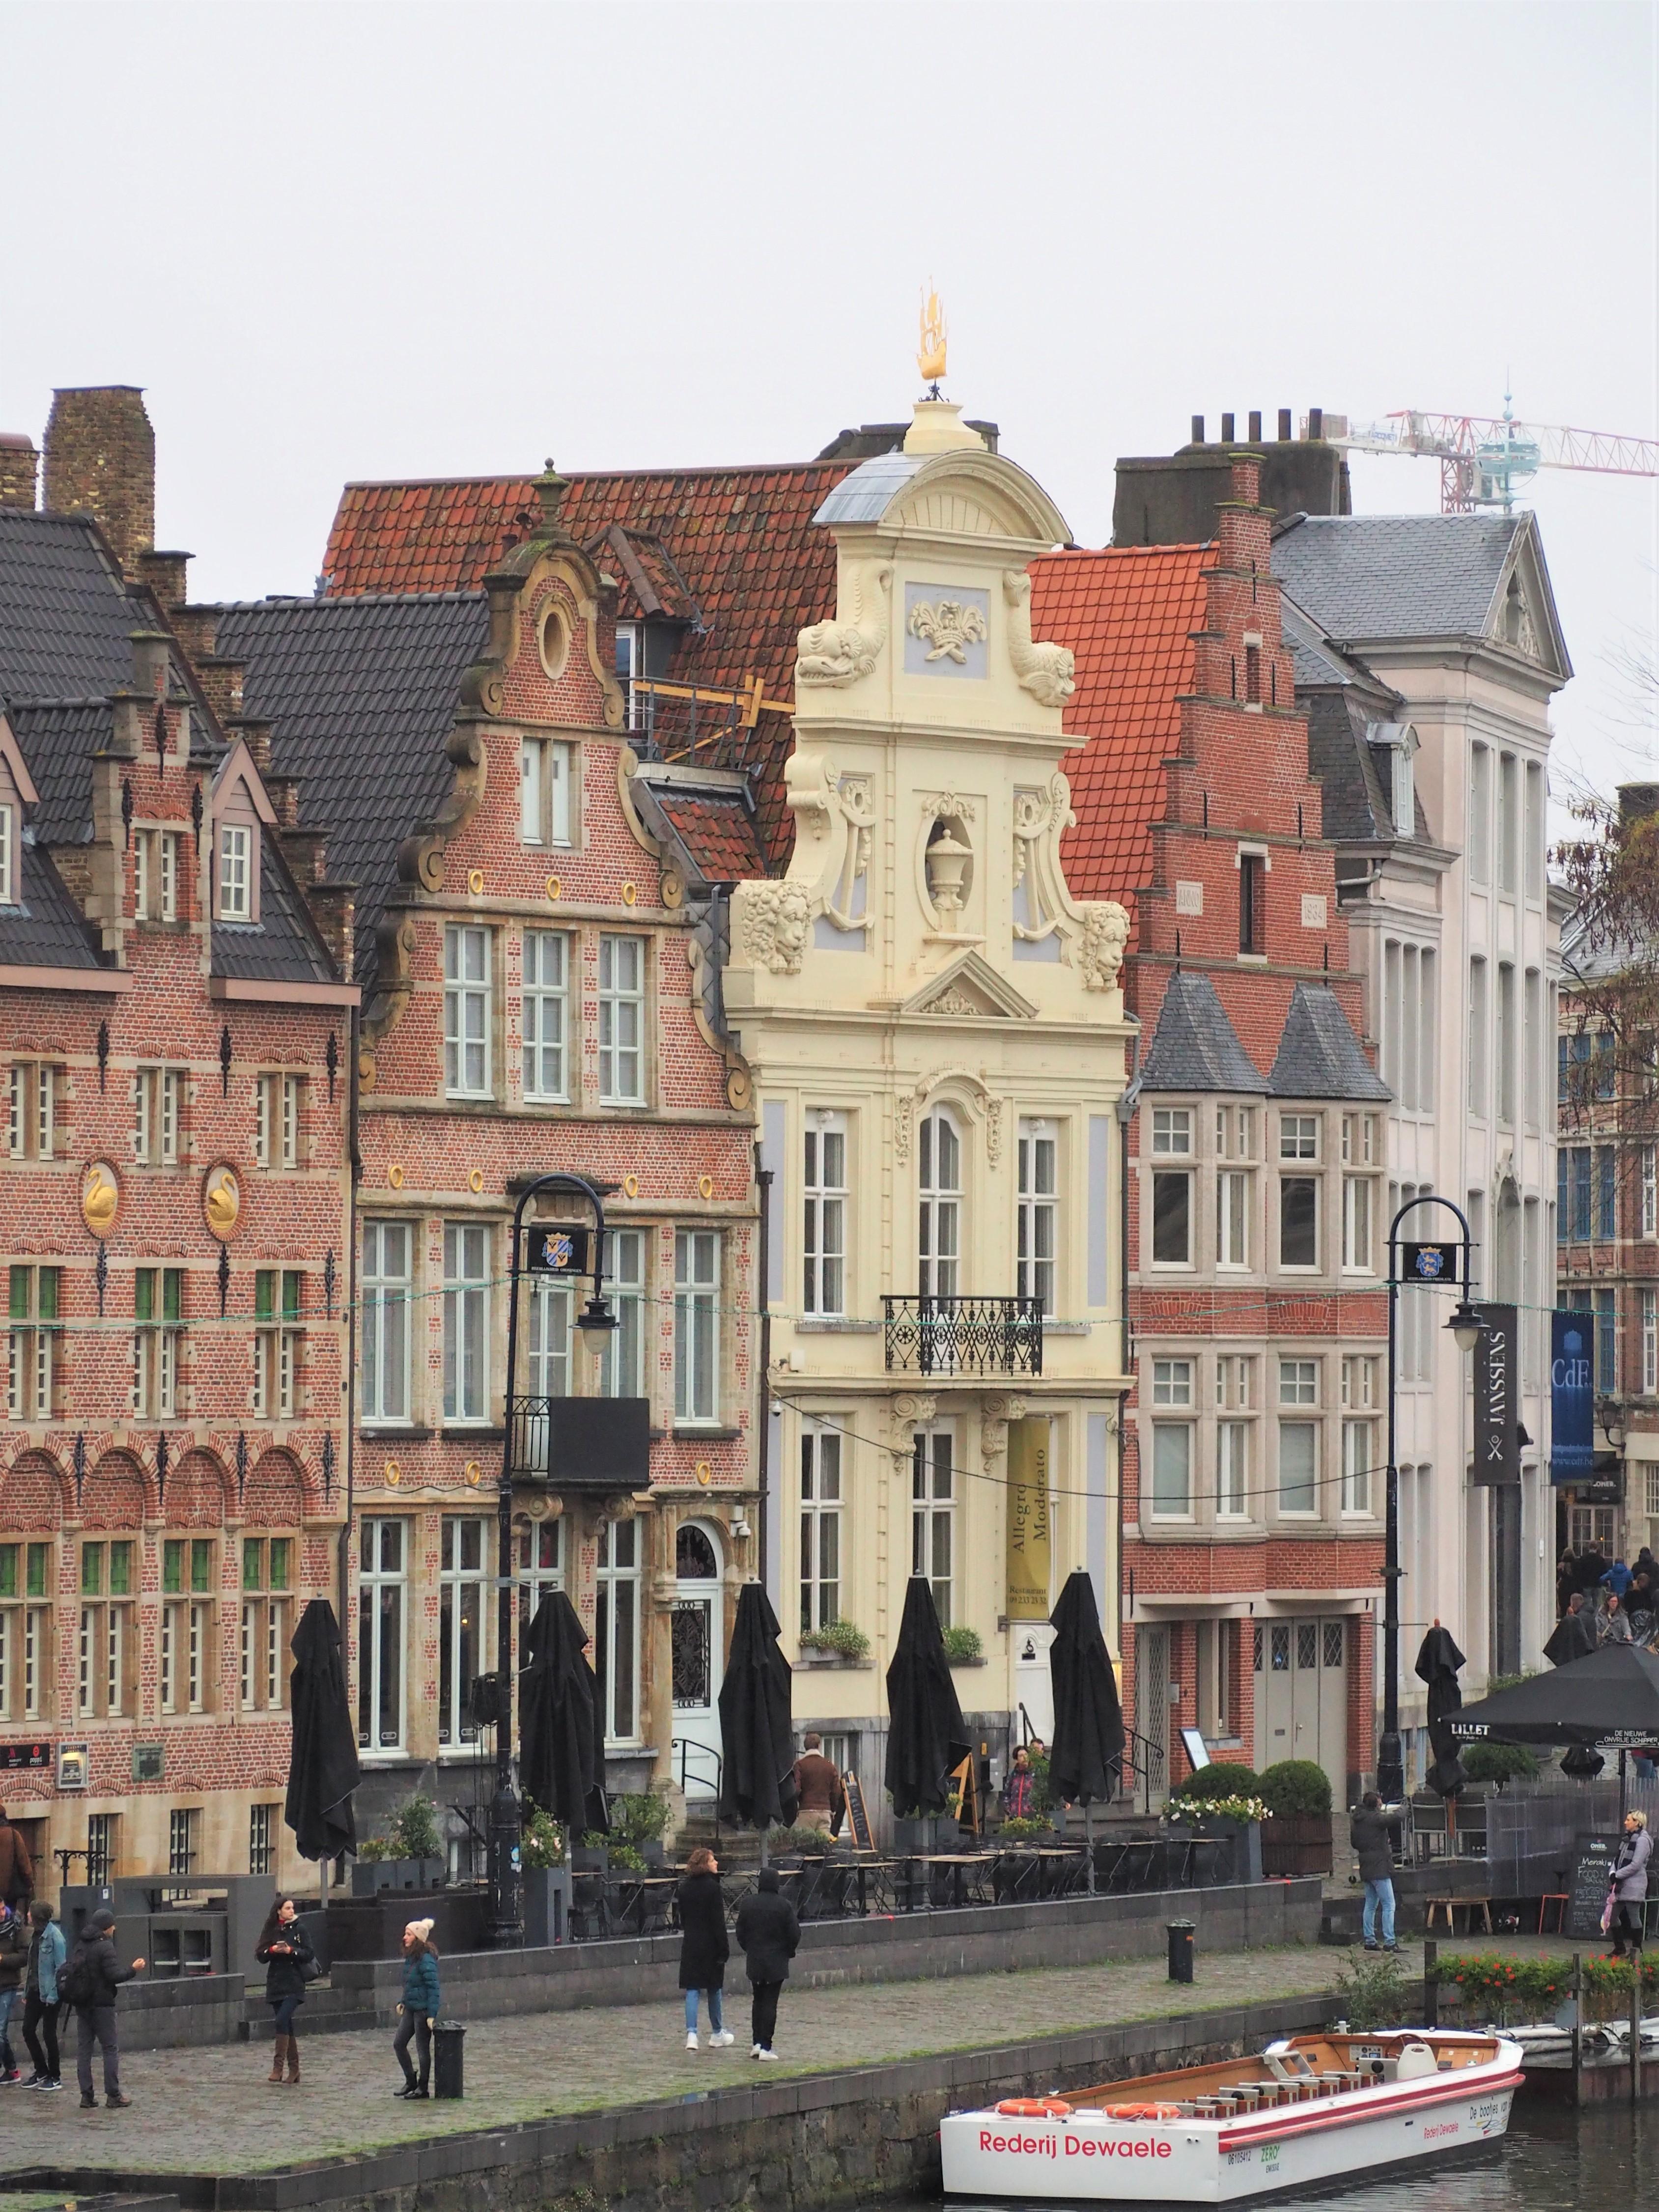 Gand belgique visiter gralei clioandco blog voyage